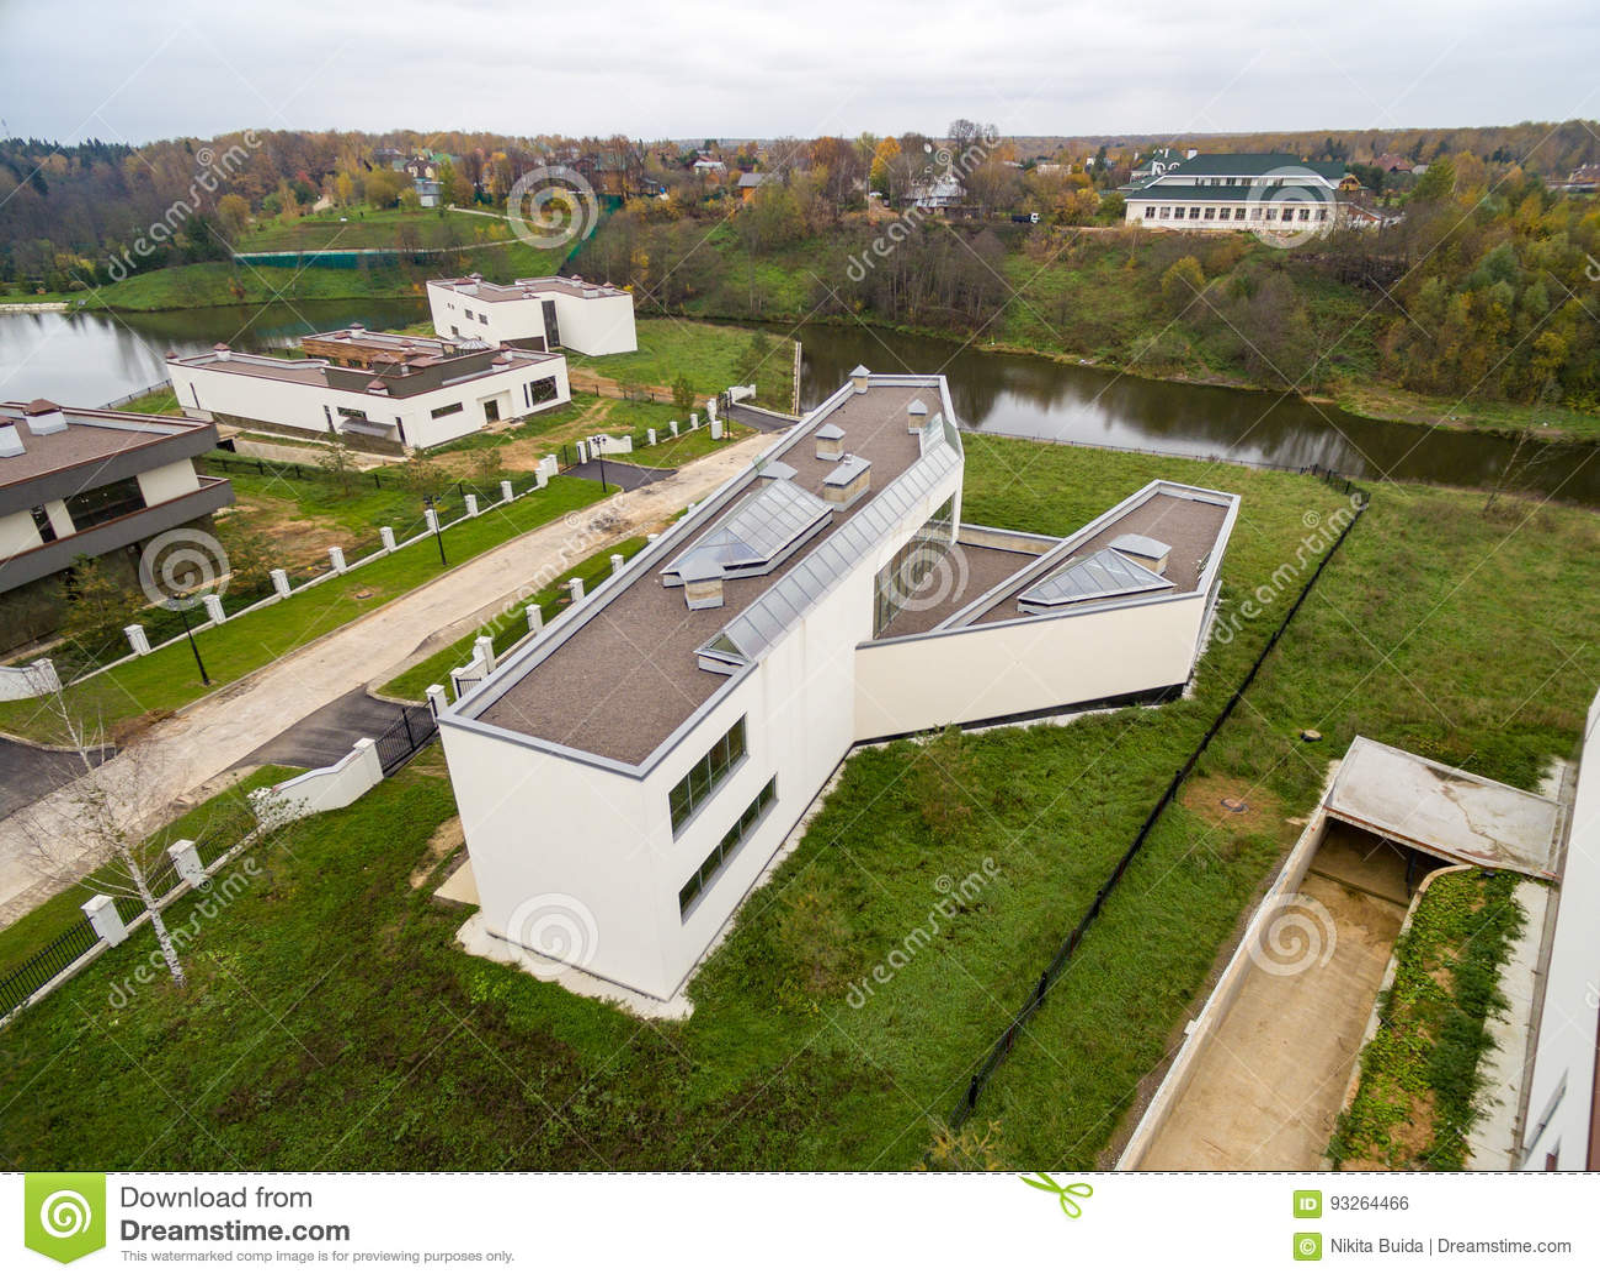 Case di campagna moderne in costruzione fotografia stock for Costruzione di case a prezzi accessibili